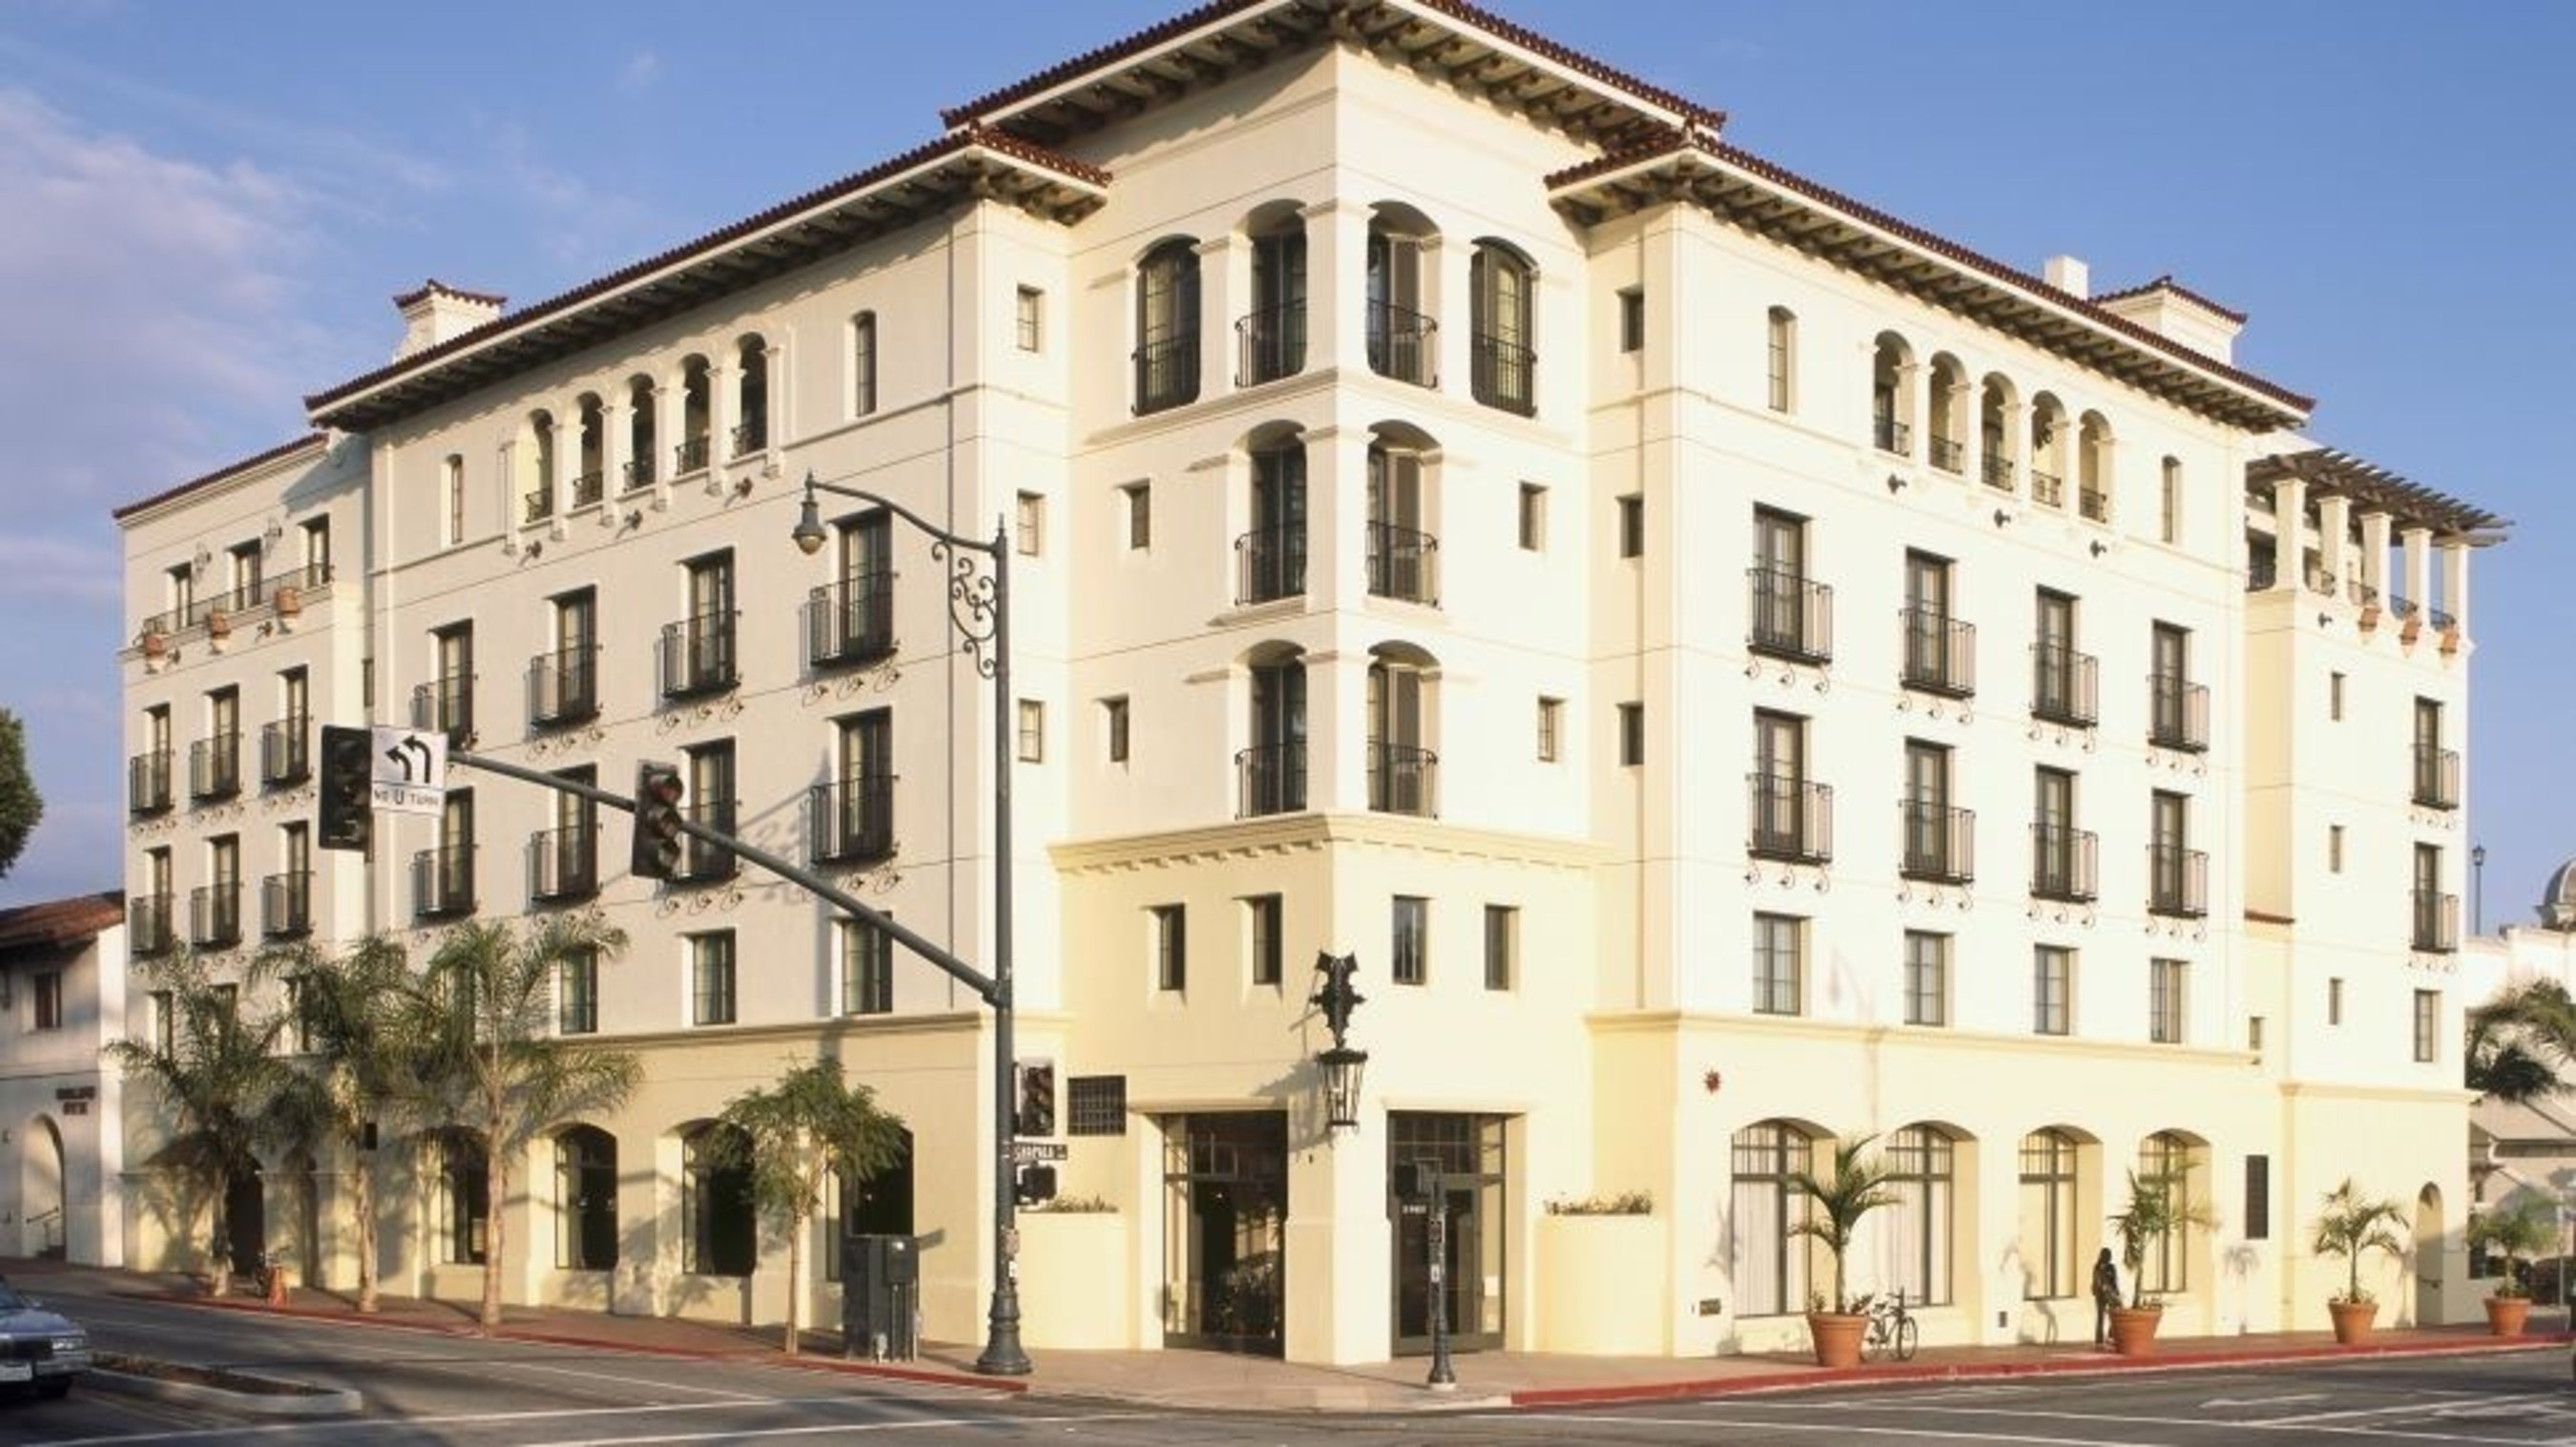 Xenia Hotels Resorts Acquires The Riverplace Hotel In Portland Oregon The Canary Hotel In Santa Barbara California And The Hotel Palomar In Philadelphia Pennsylvania